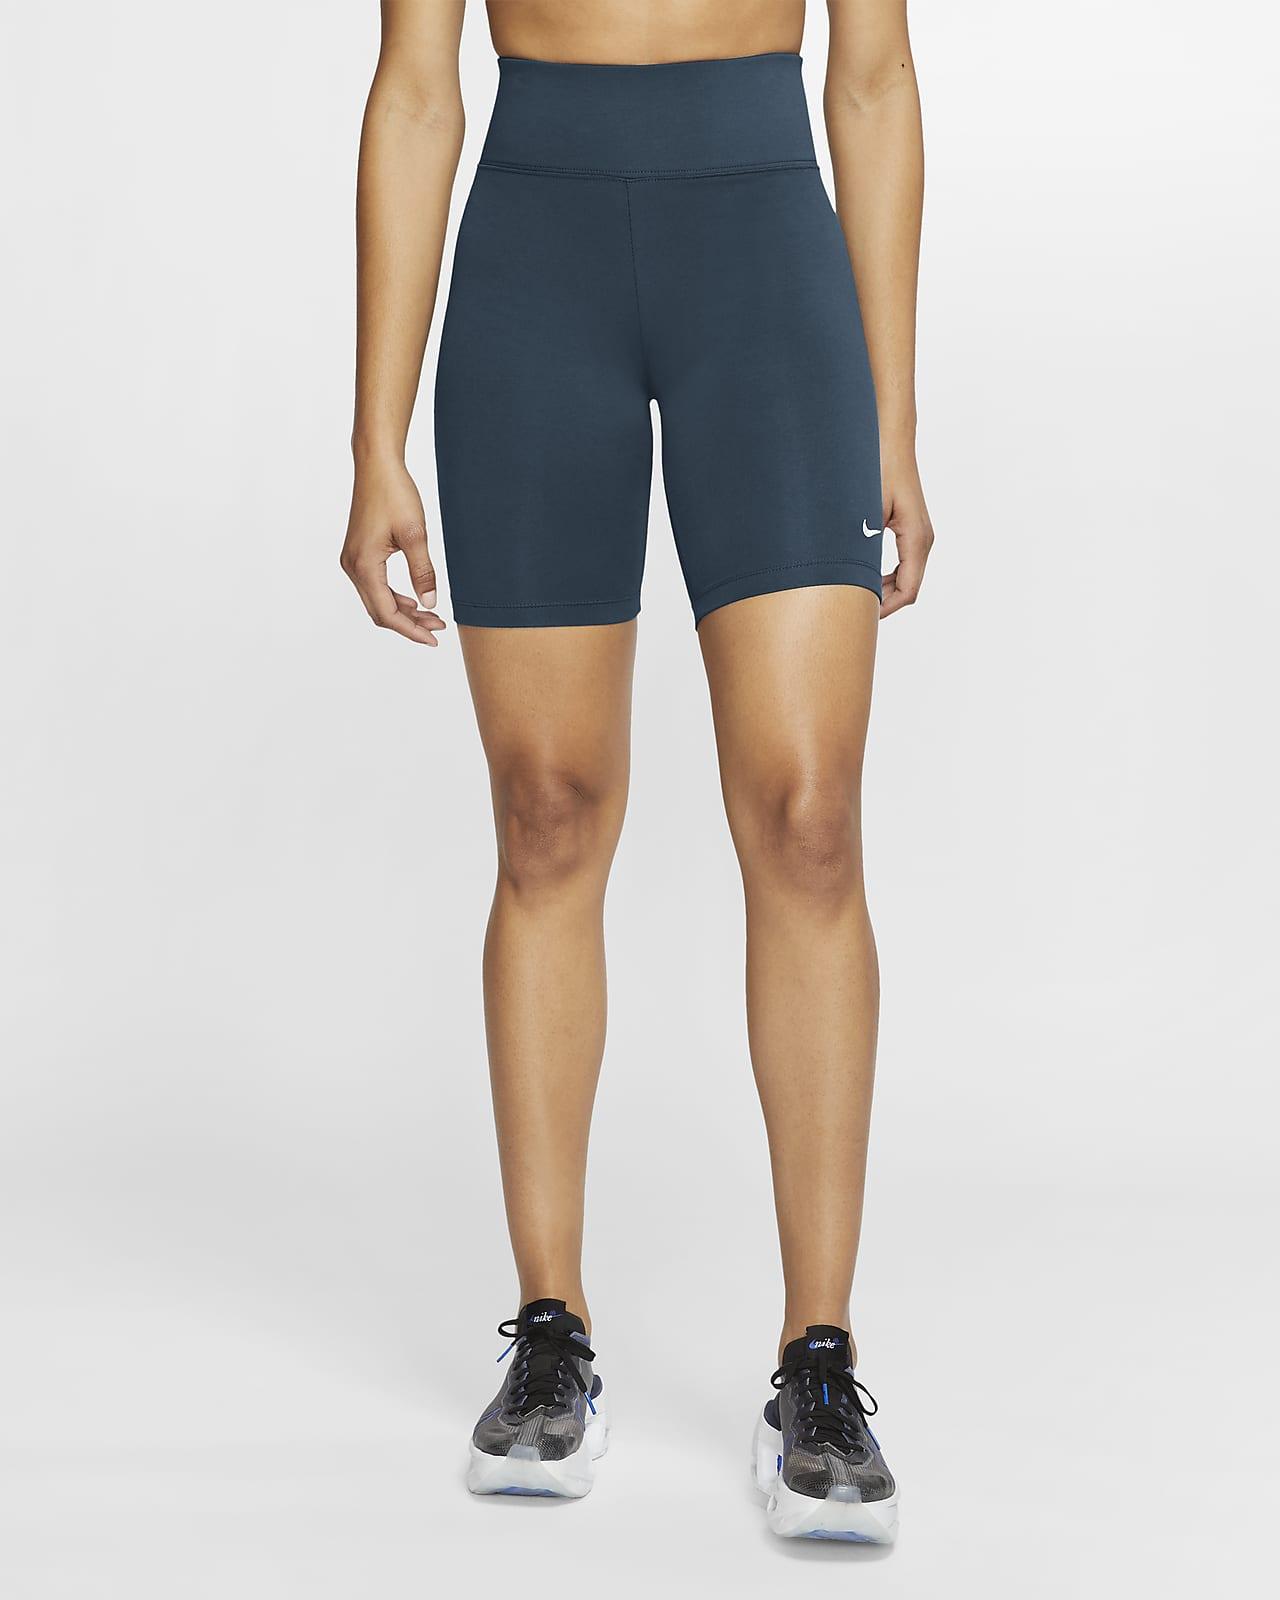 Nike Sportswear Leg-A-See Women's Bike Shorts